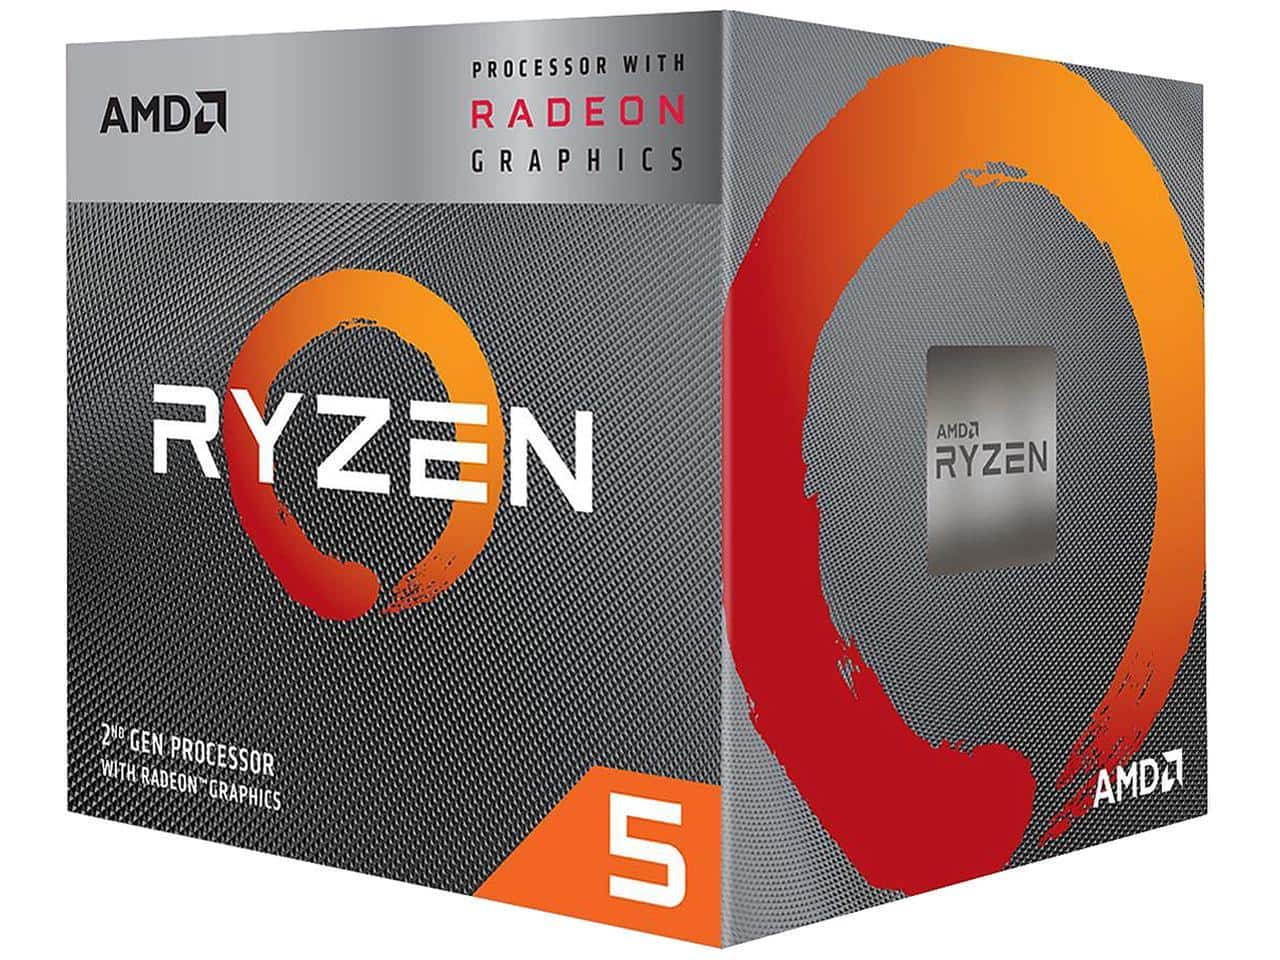 AMD Ryzen 3400g Newegg $139.99